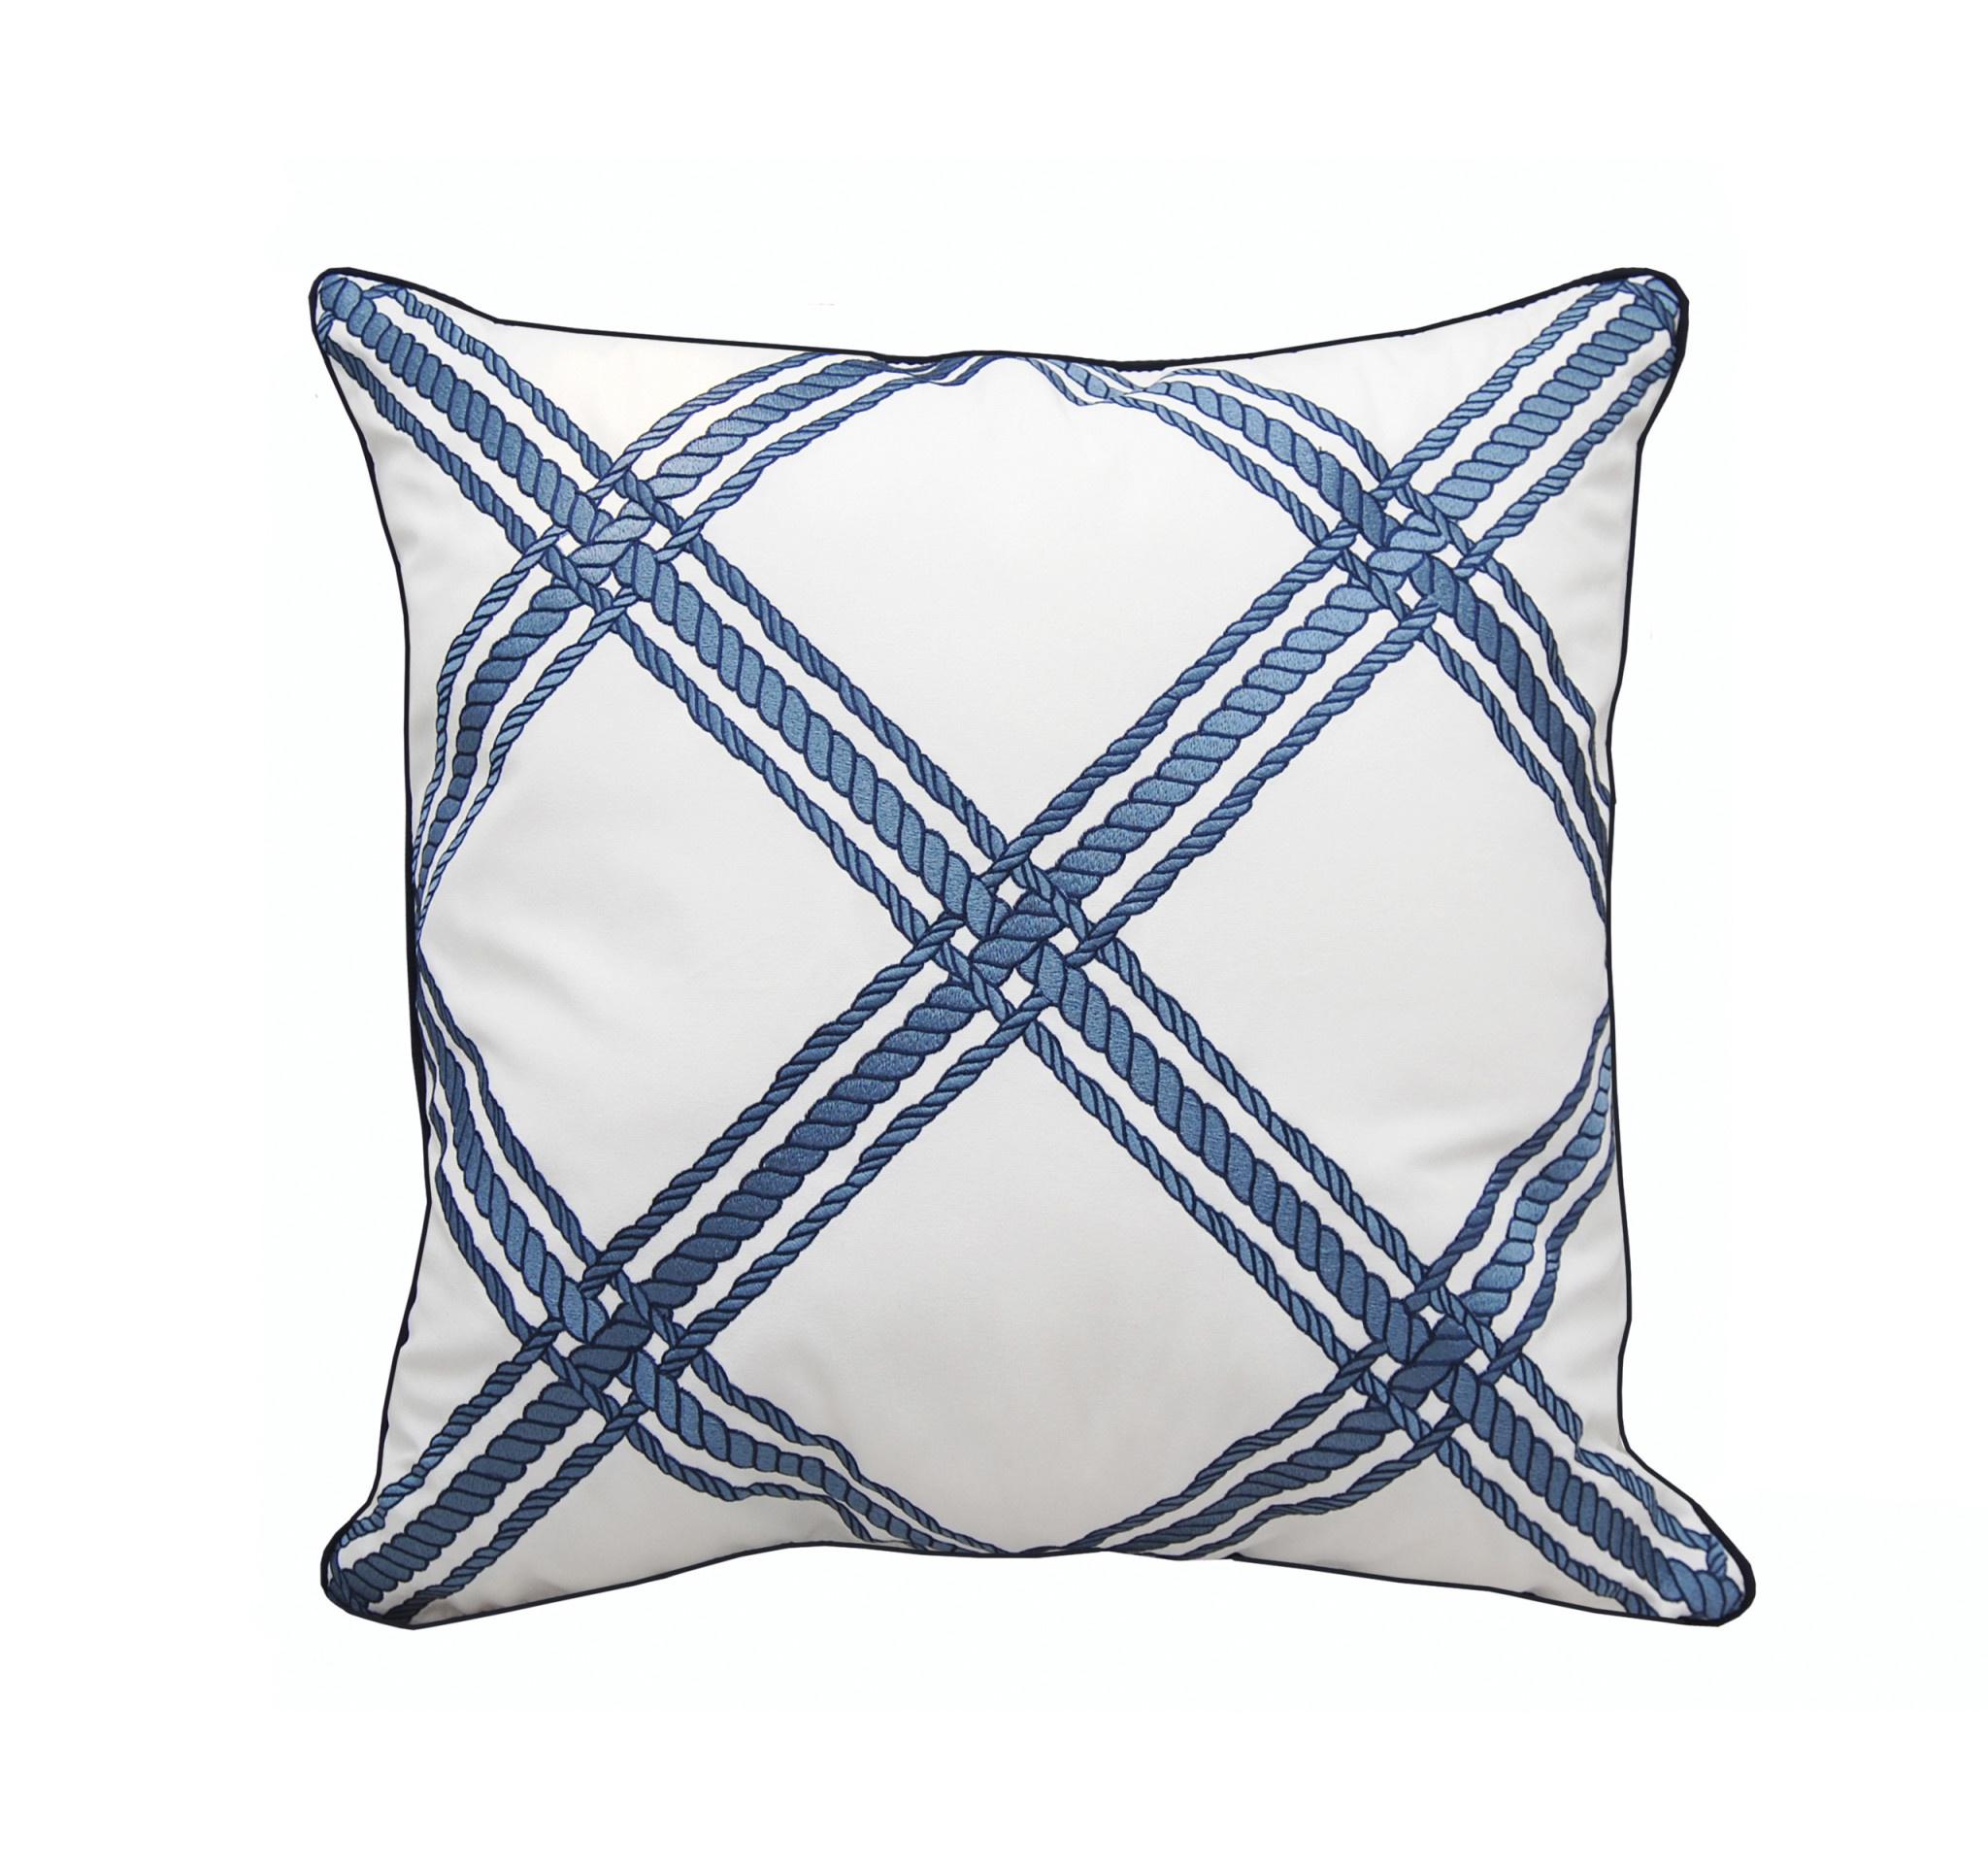 Nautical Rope Lattice Indoor/Outdoor Pillow